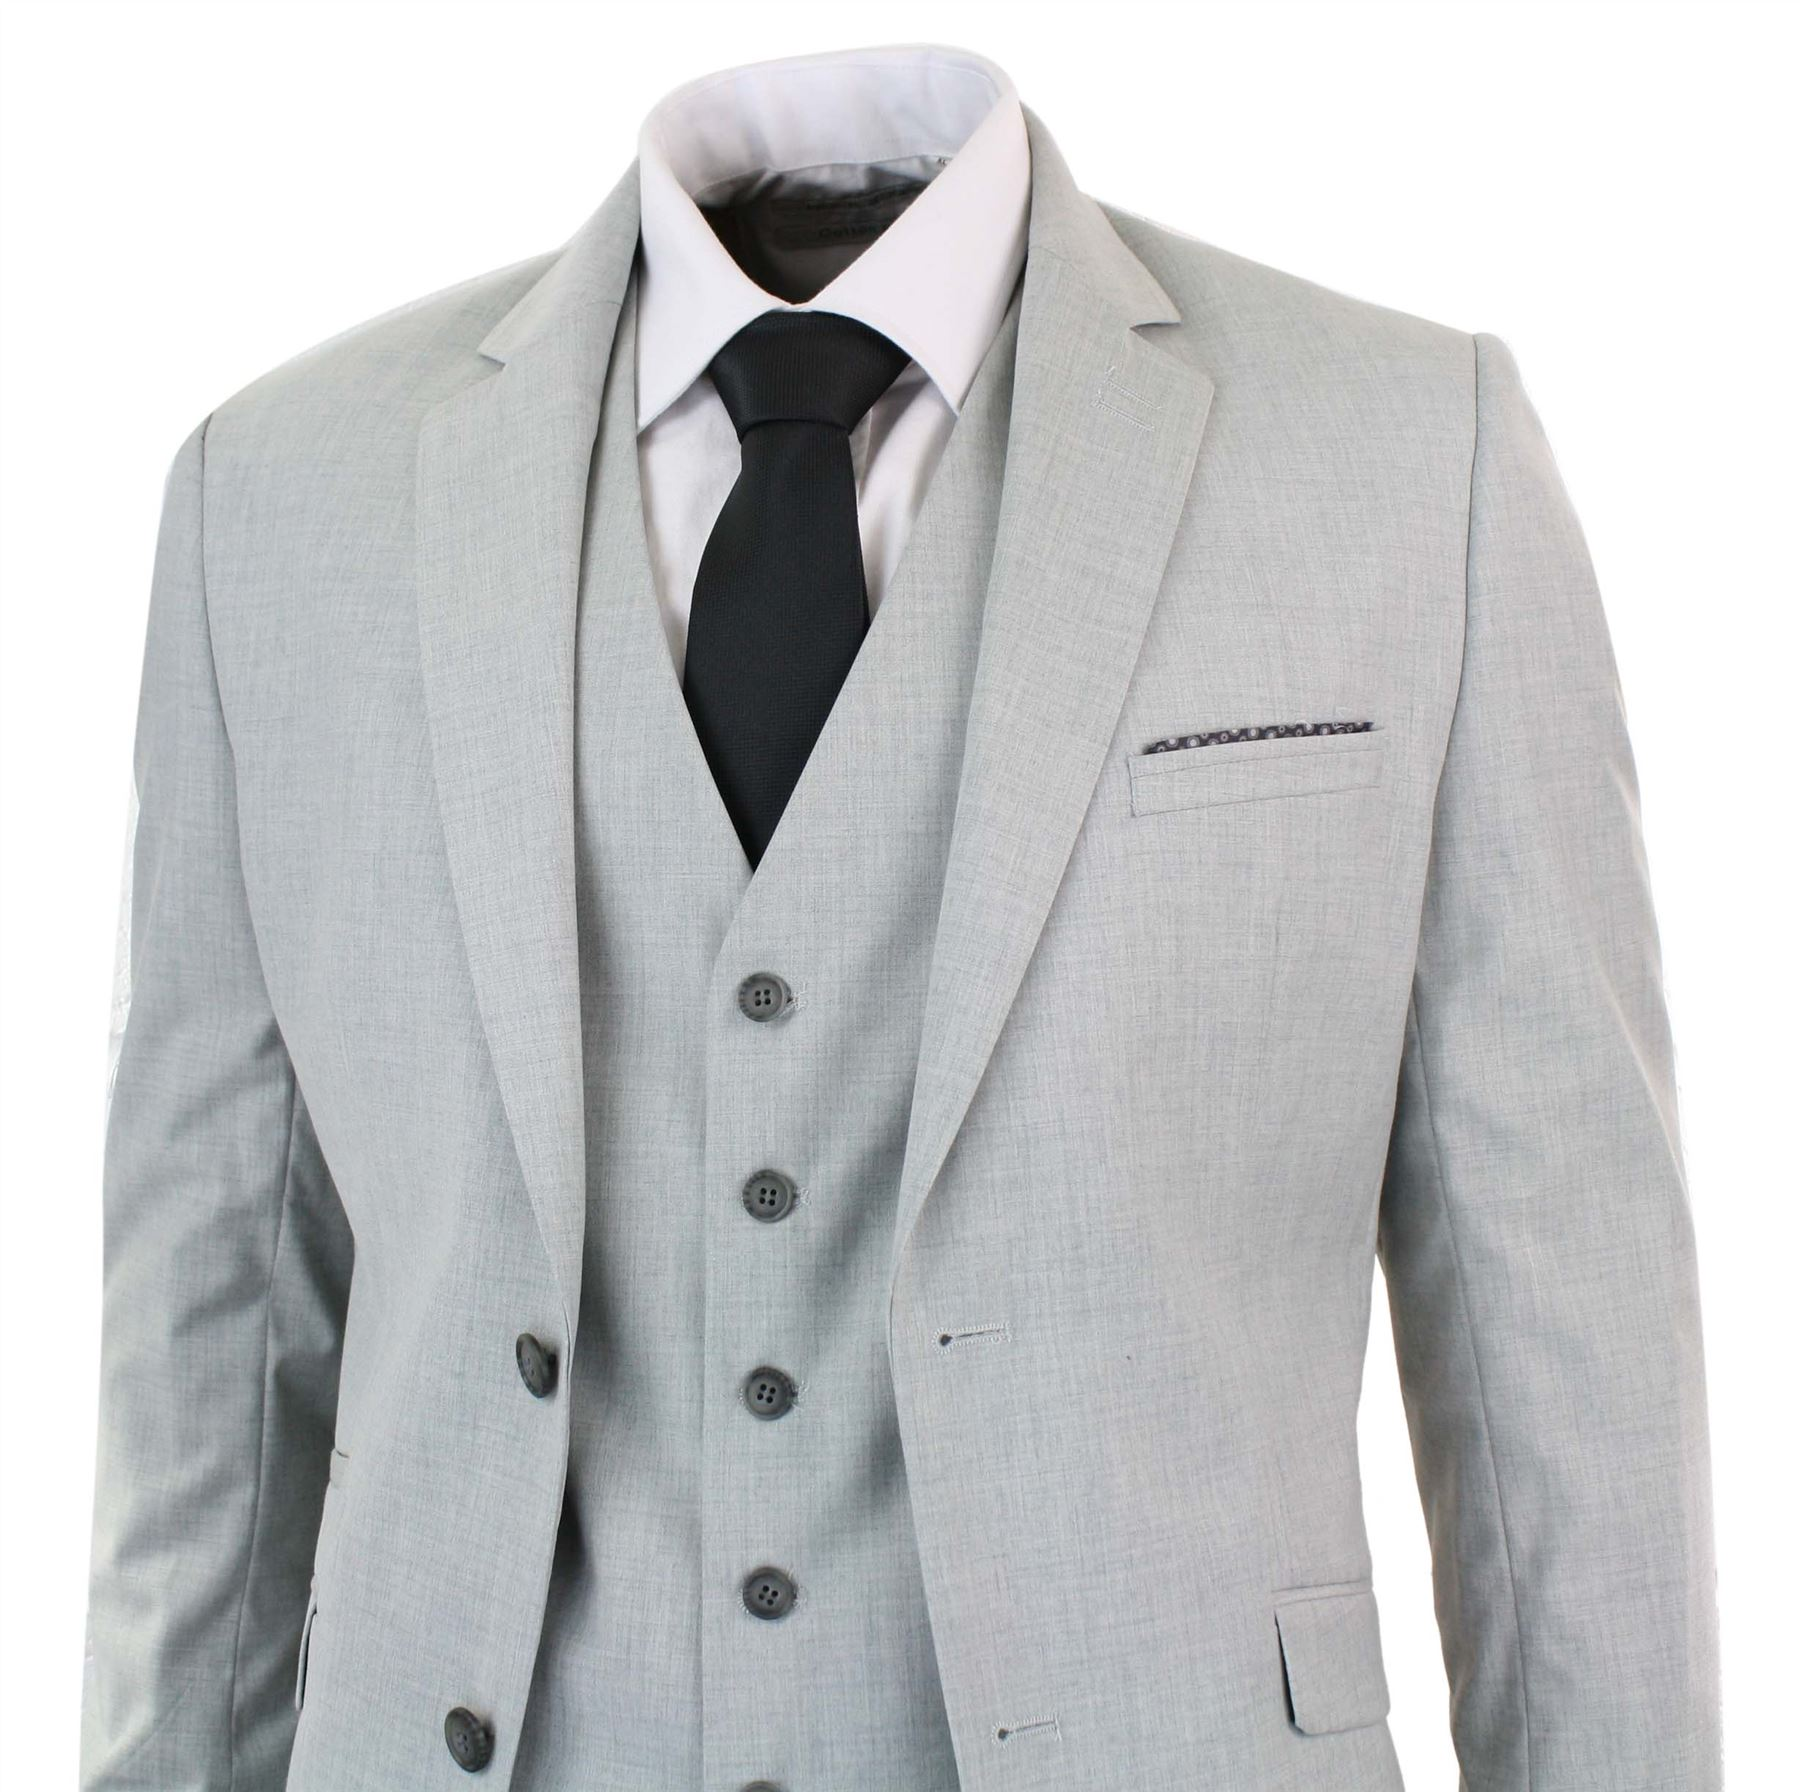 mens 3 piece light grey suit blazer waistcoat trouser. Black Bedroom Furniture Sets. Home Design Ideas